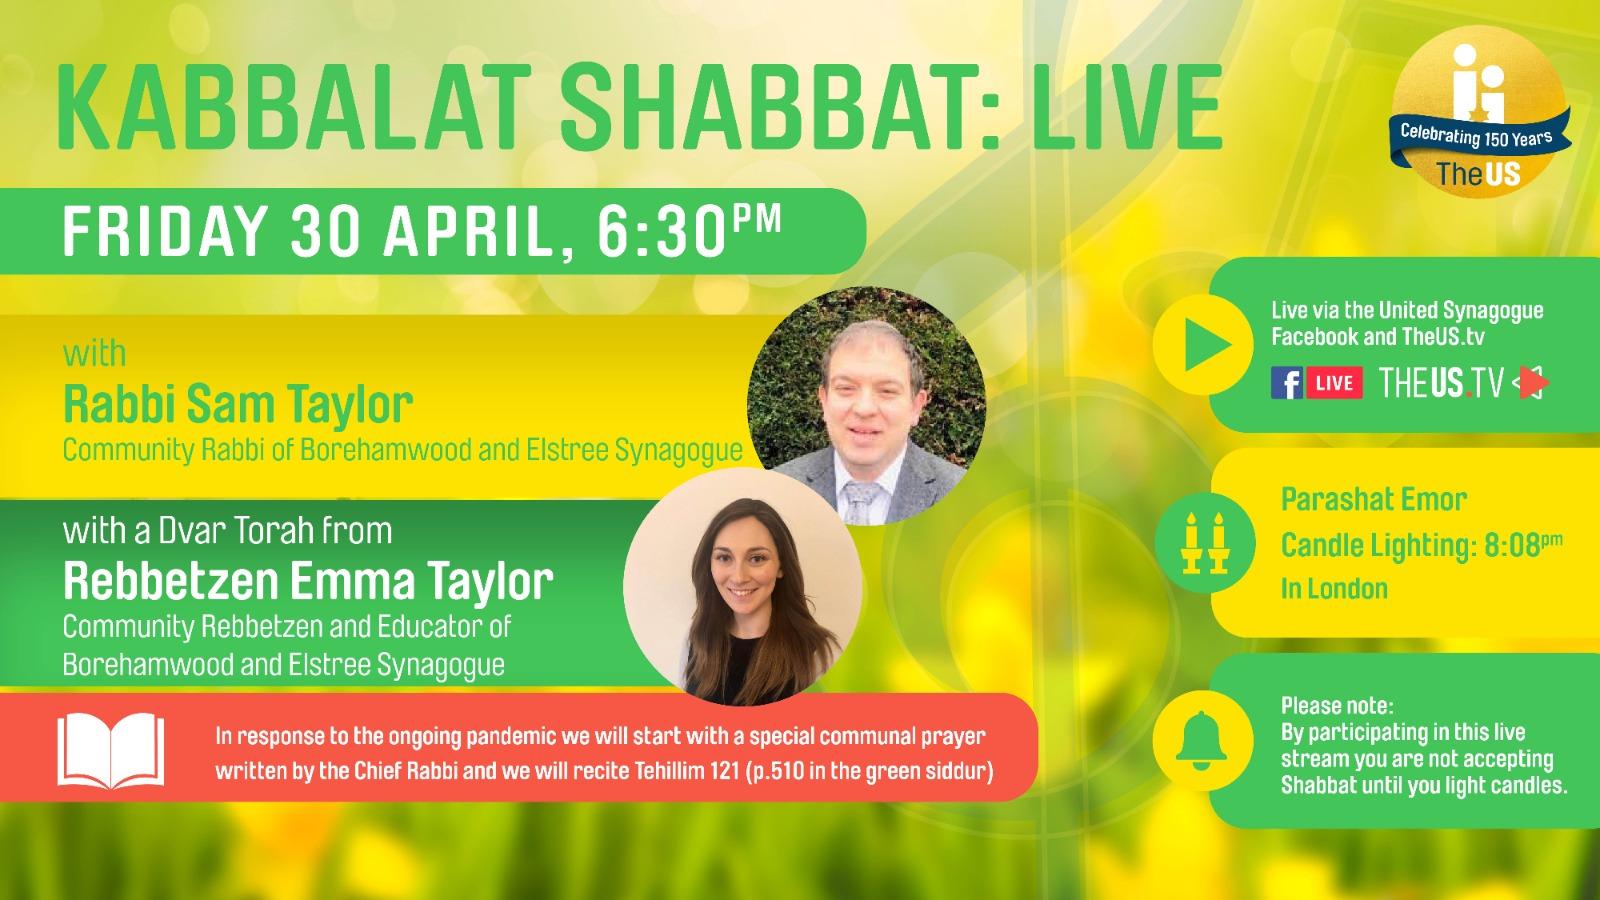 Kabbalat Shabbat Live at 6:30pm